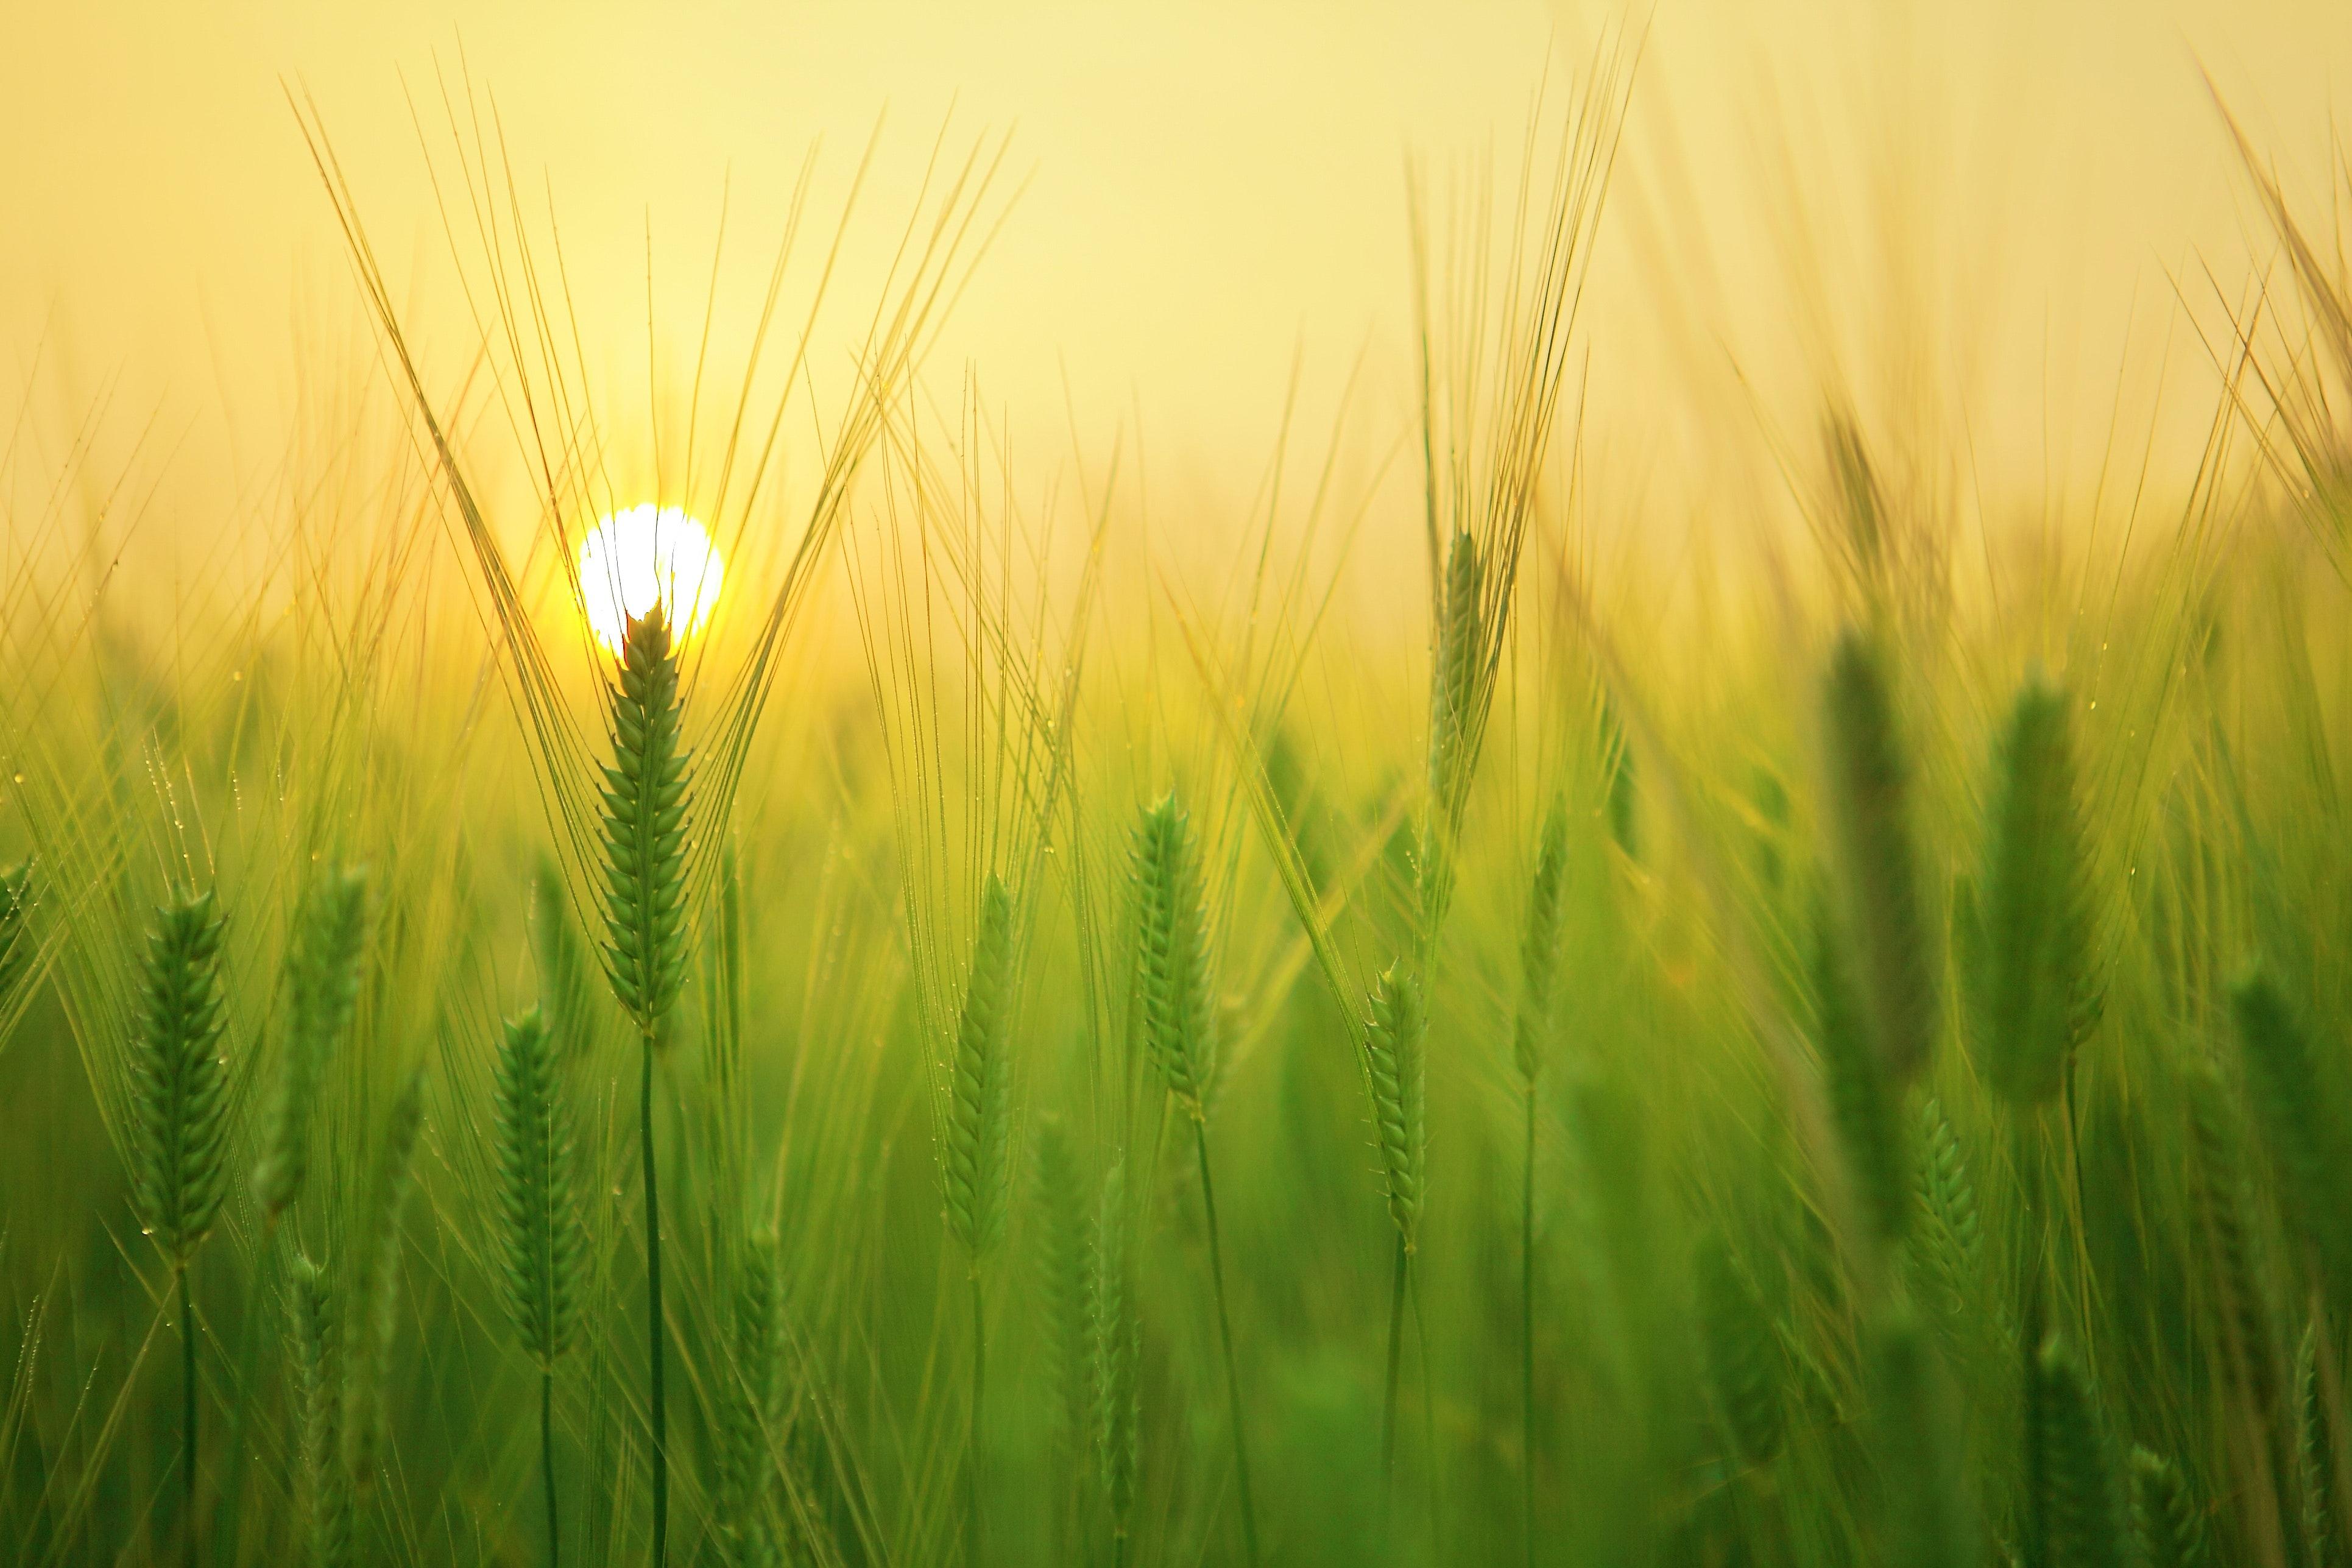 morning sun shining on a fresh field of barley